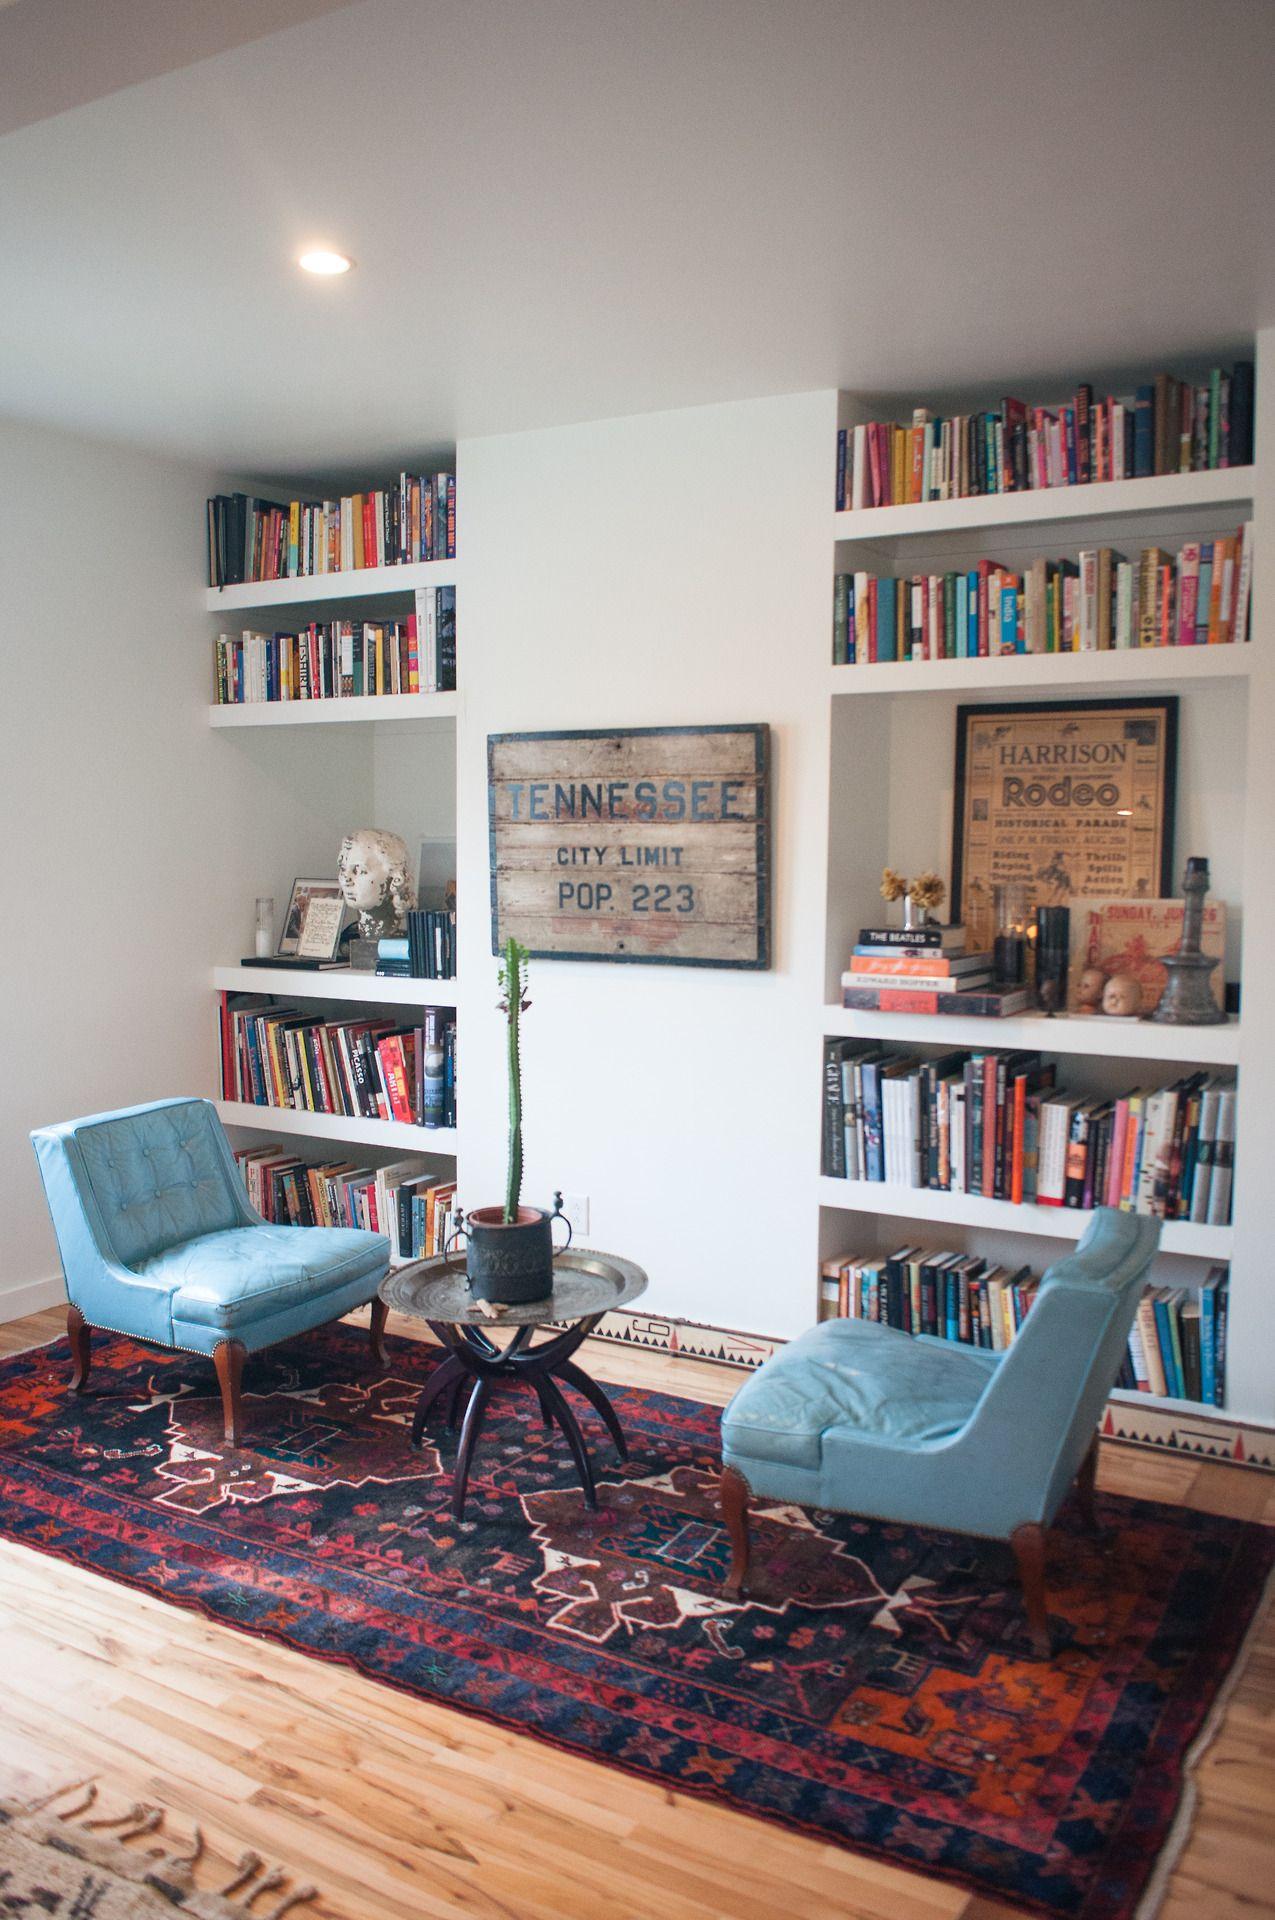 Pin by parisa borgia on interior pinterest shelving walls and room